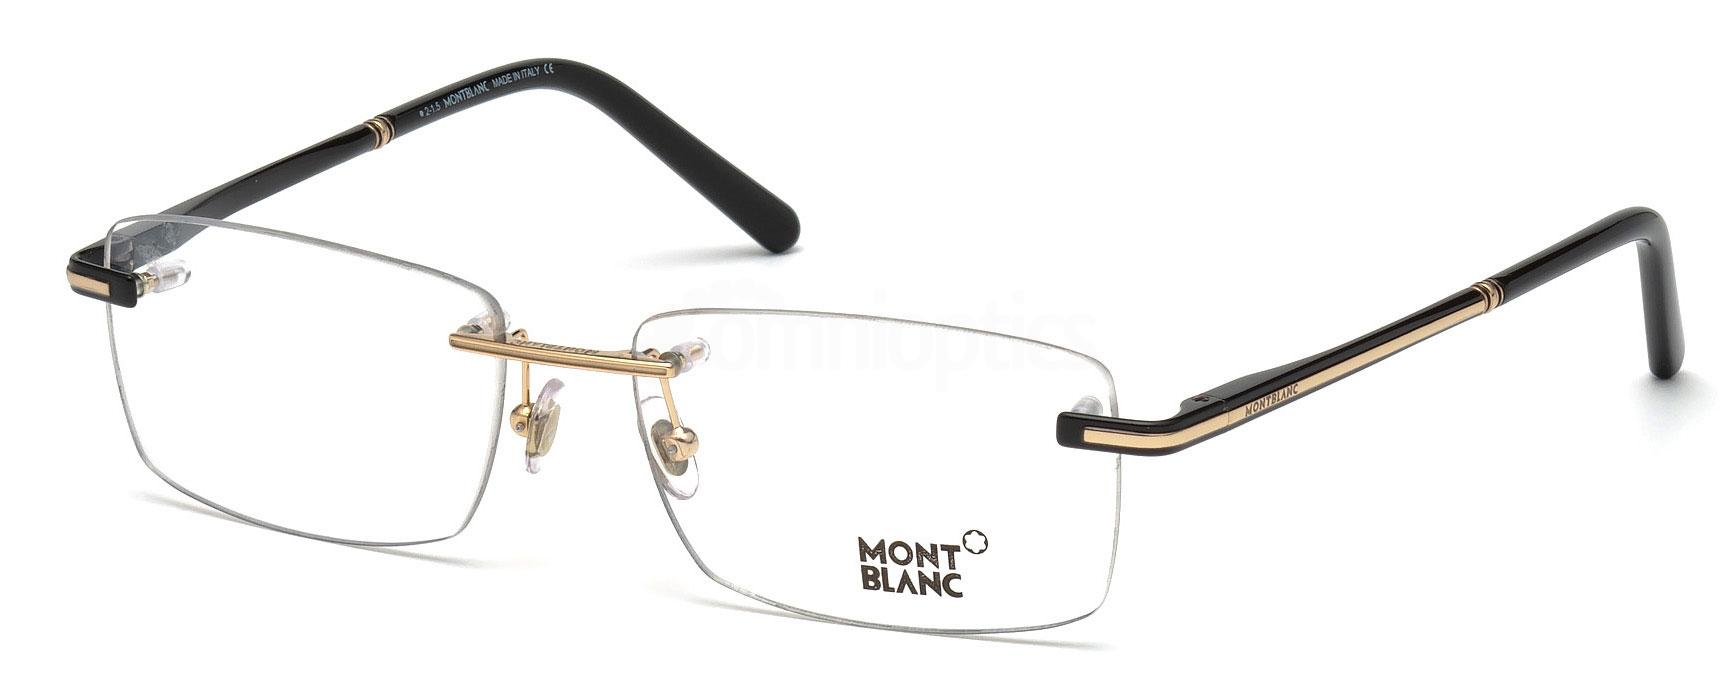 001 MB0577 Glasses, Mont Blanc